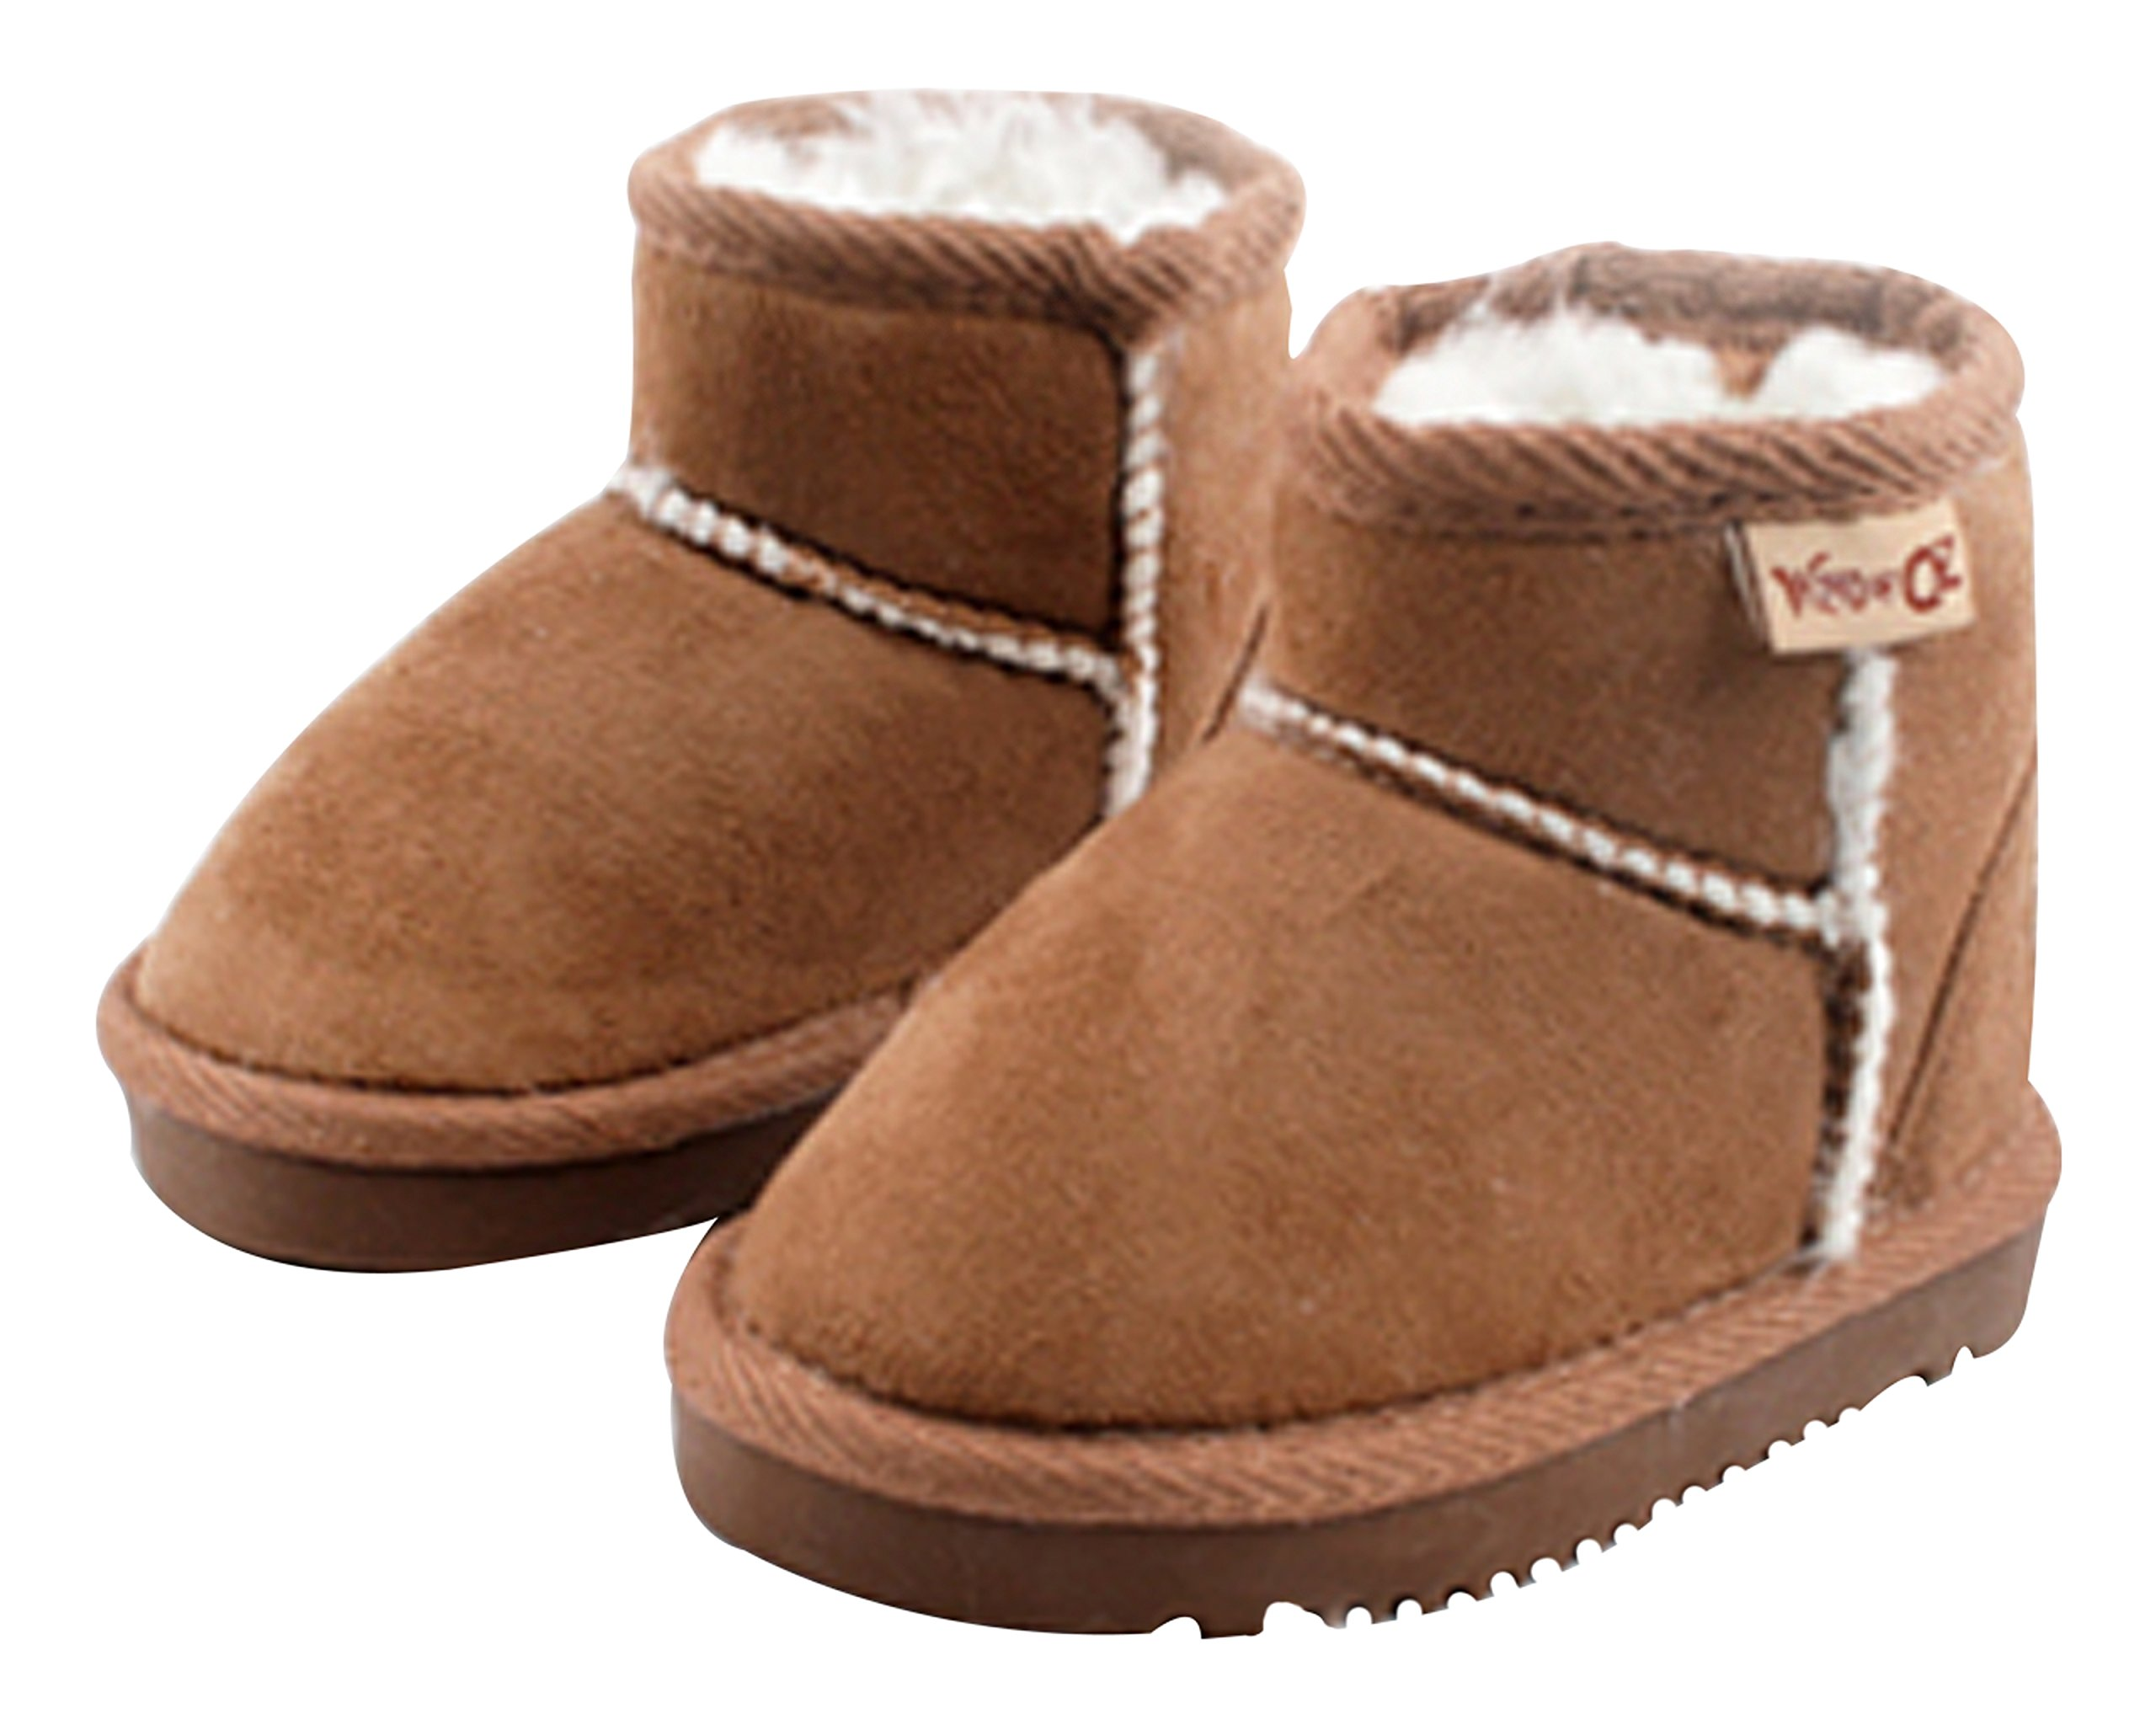 Ozkiz Boys Girls oz Mini Boots Little Kid/Toddler Brown Size 1M